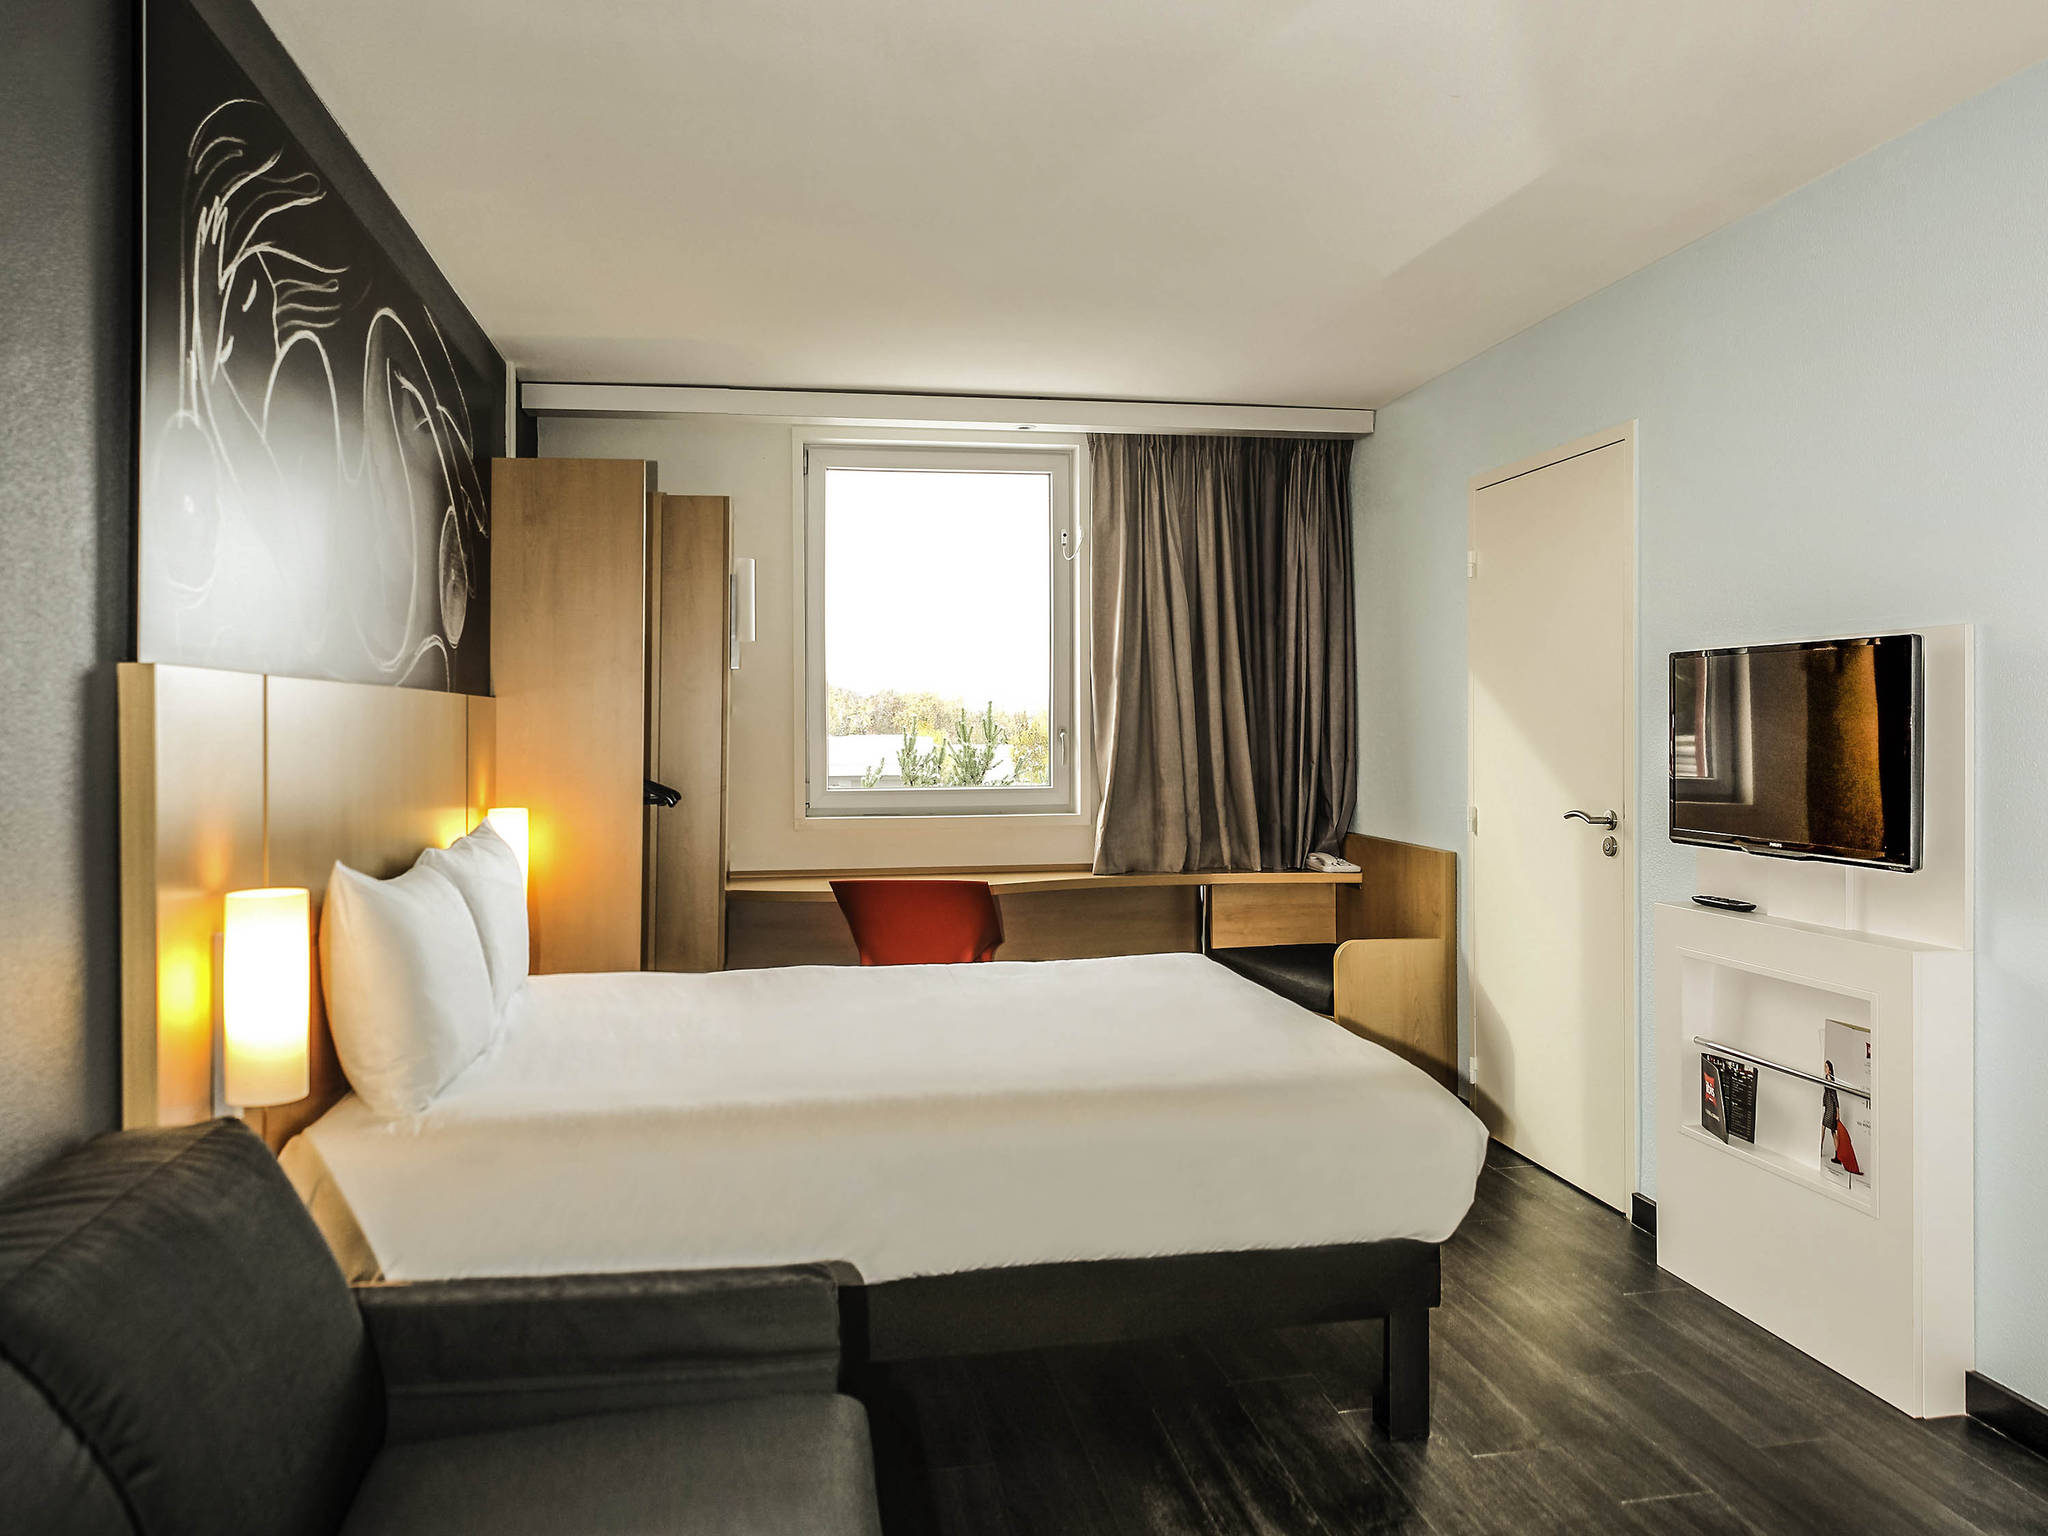 hotel in saint genis pouilly ibis saint genis pouilly gen ve. Black Bedroom Furniture Sets. Home Design Ideas